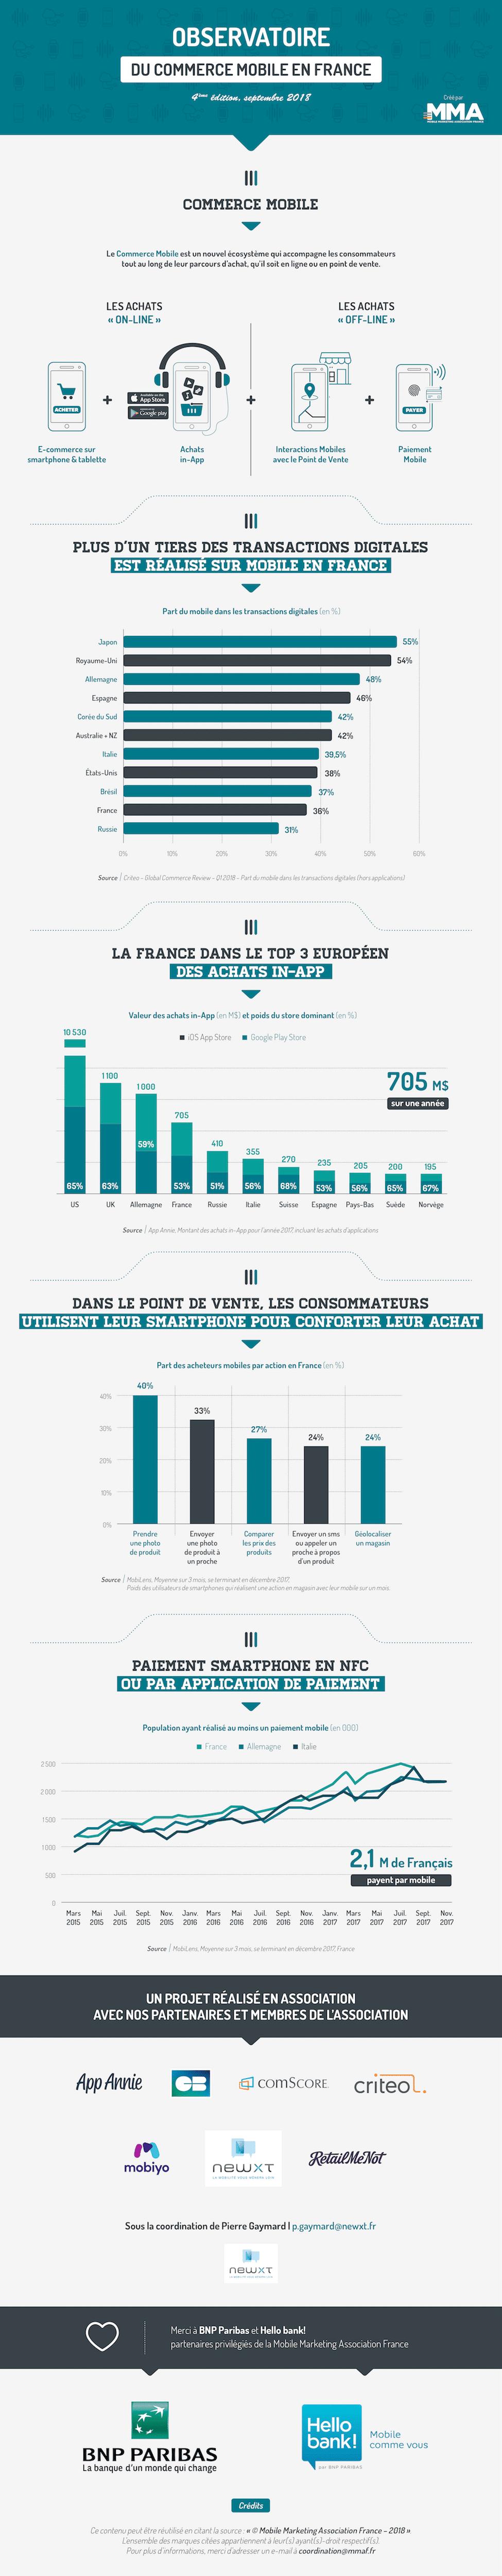 Infographie M-commerce